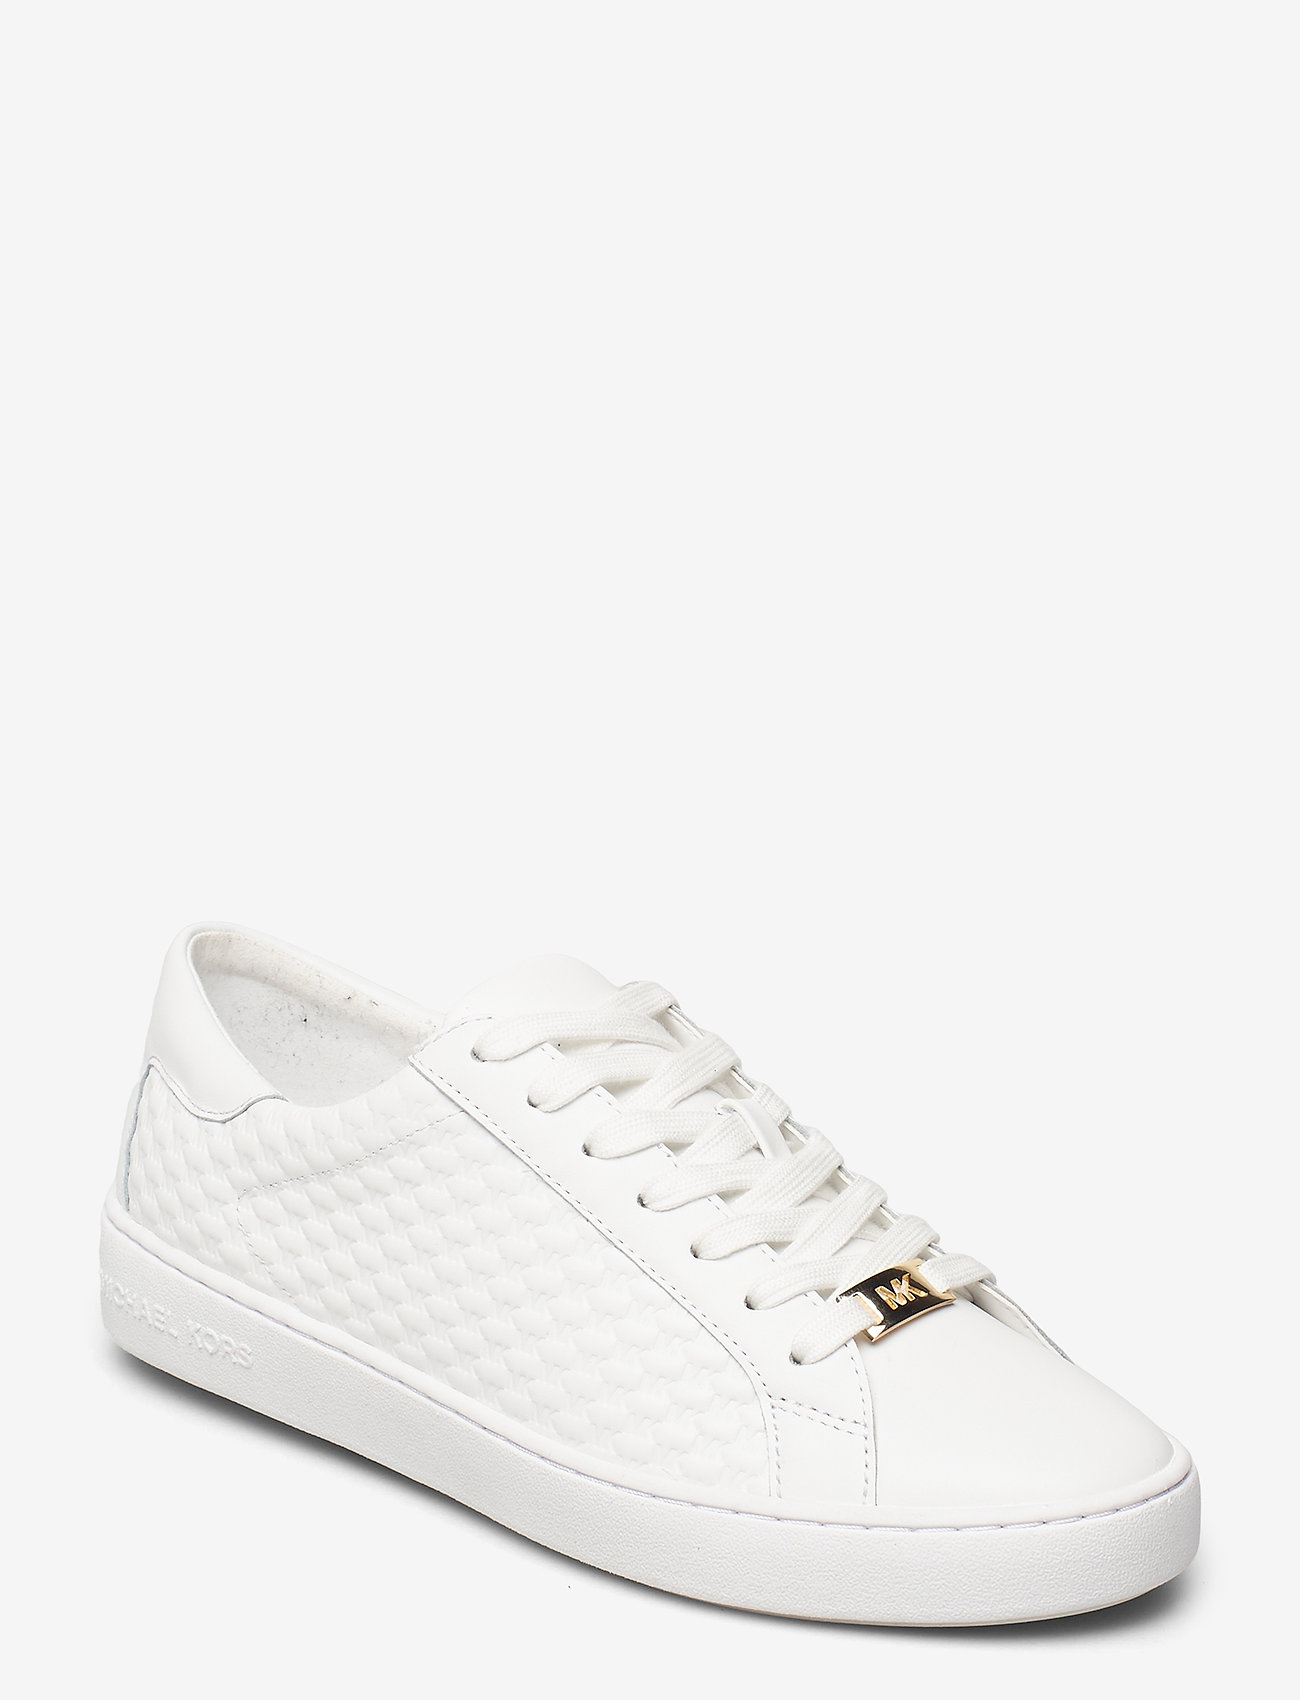 Michael Kors - COLBY SNEAKER - lage sneakers - optic white - 0